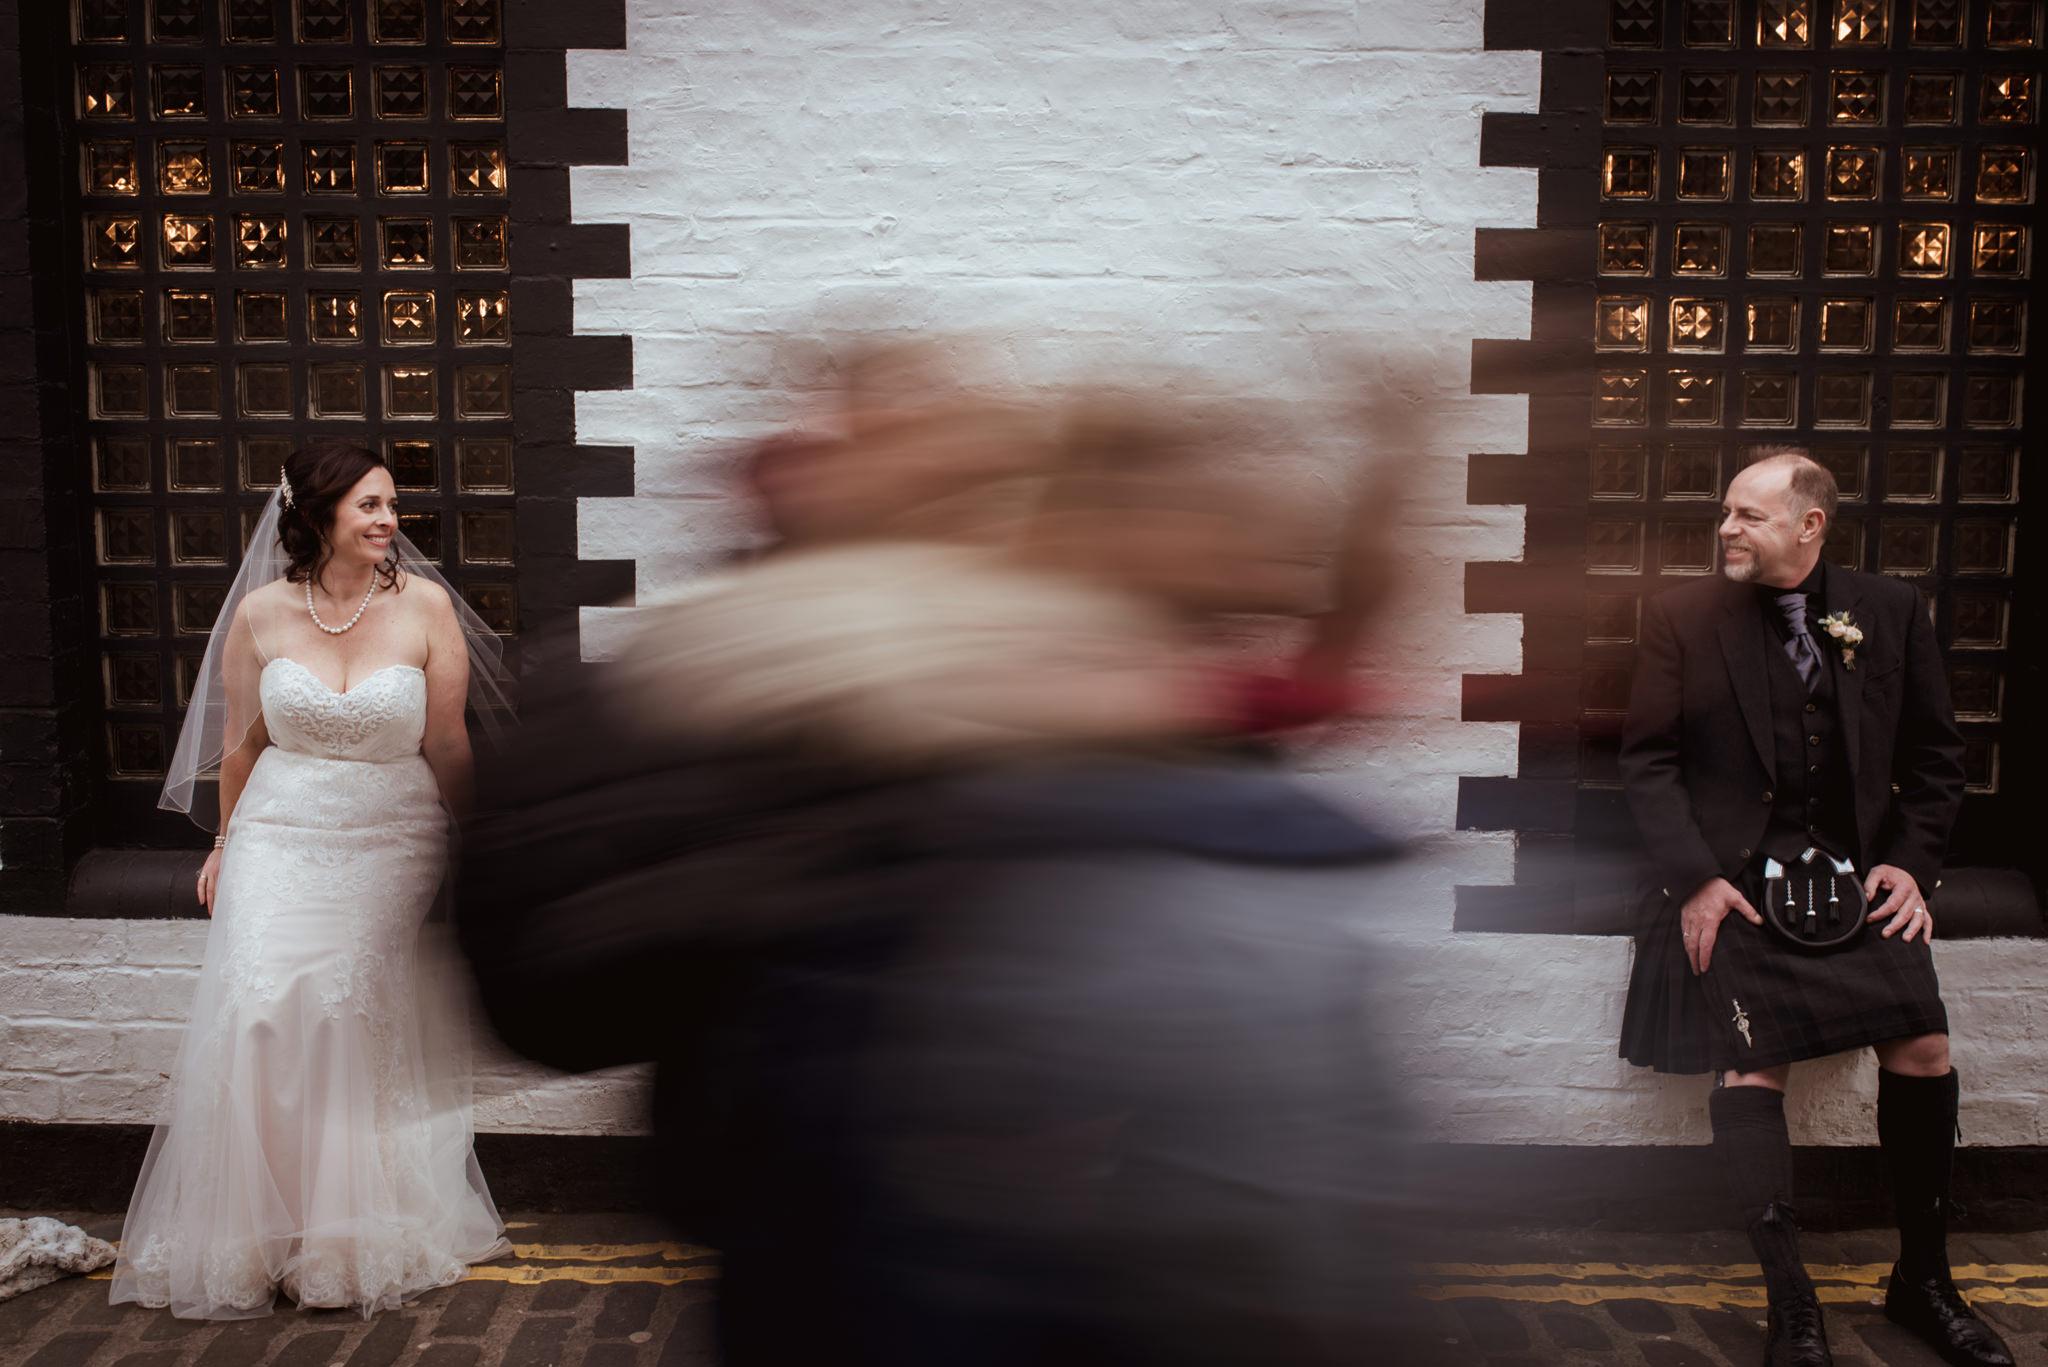 creative-wedding-photographer-ashton-lane-(1).jpg